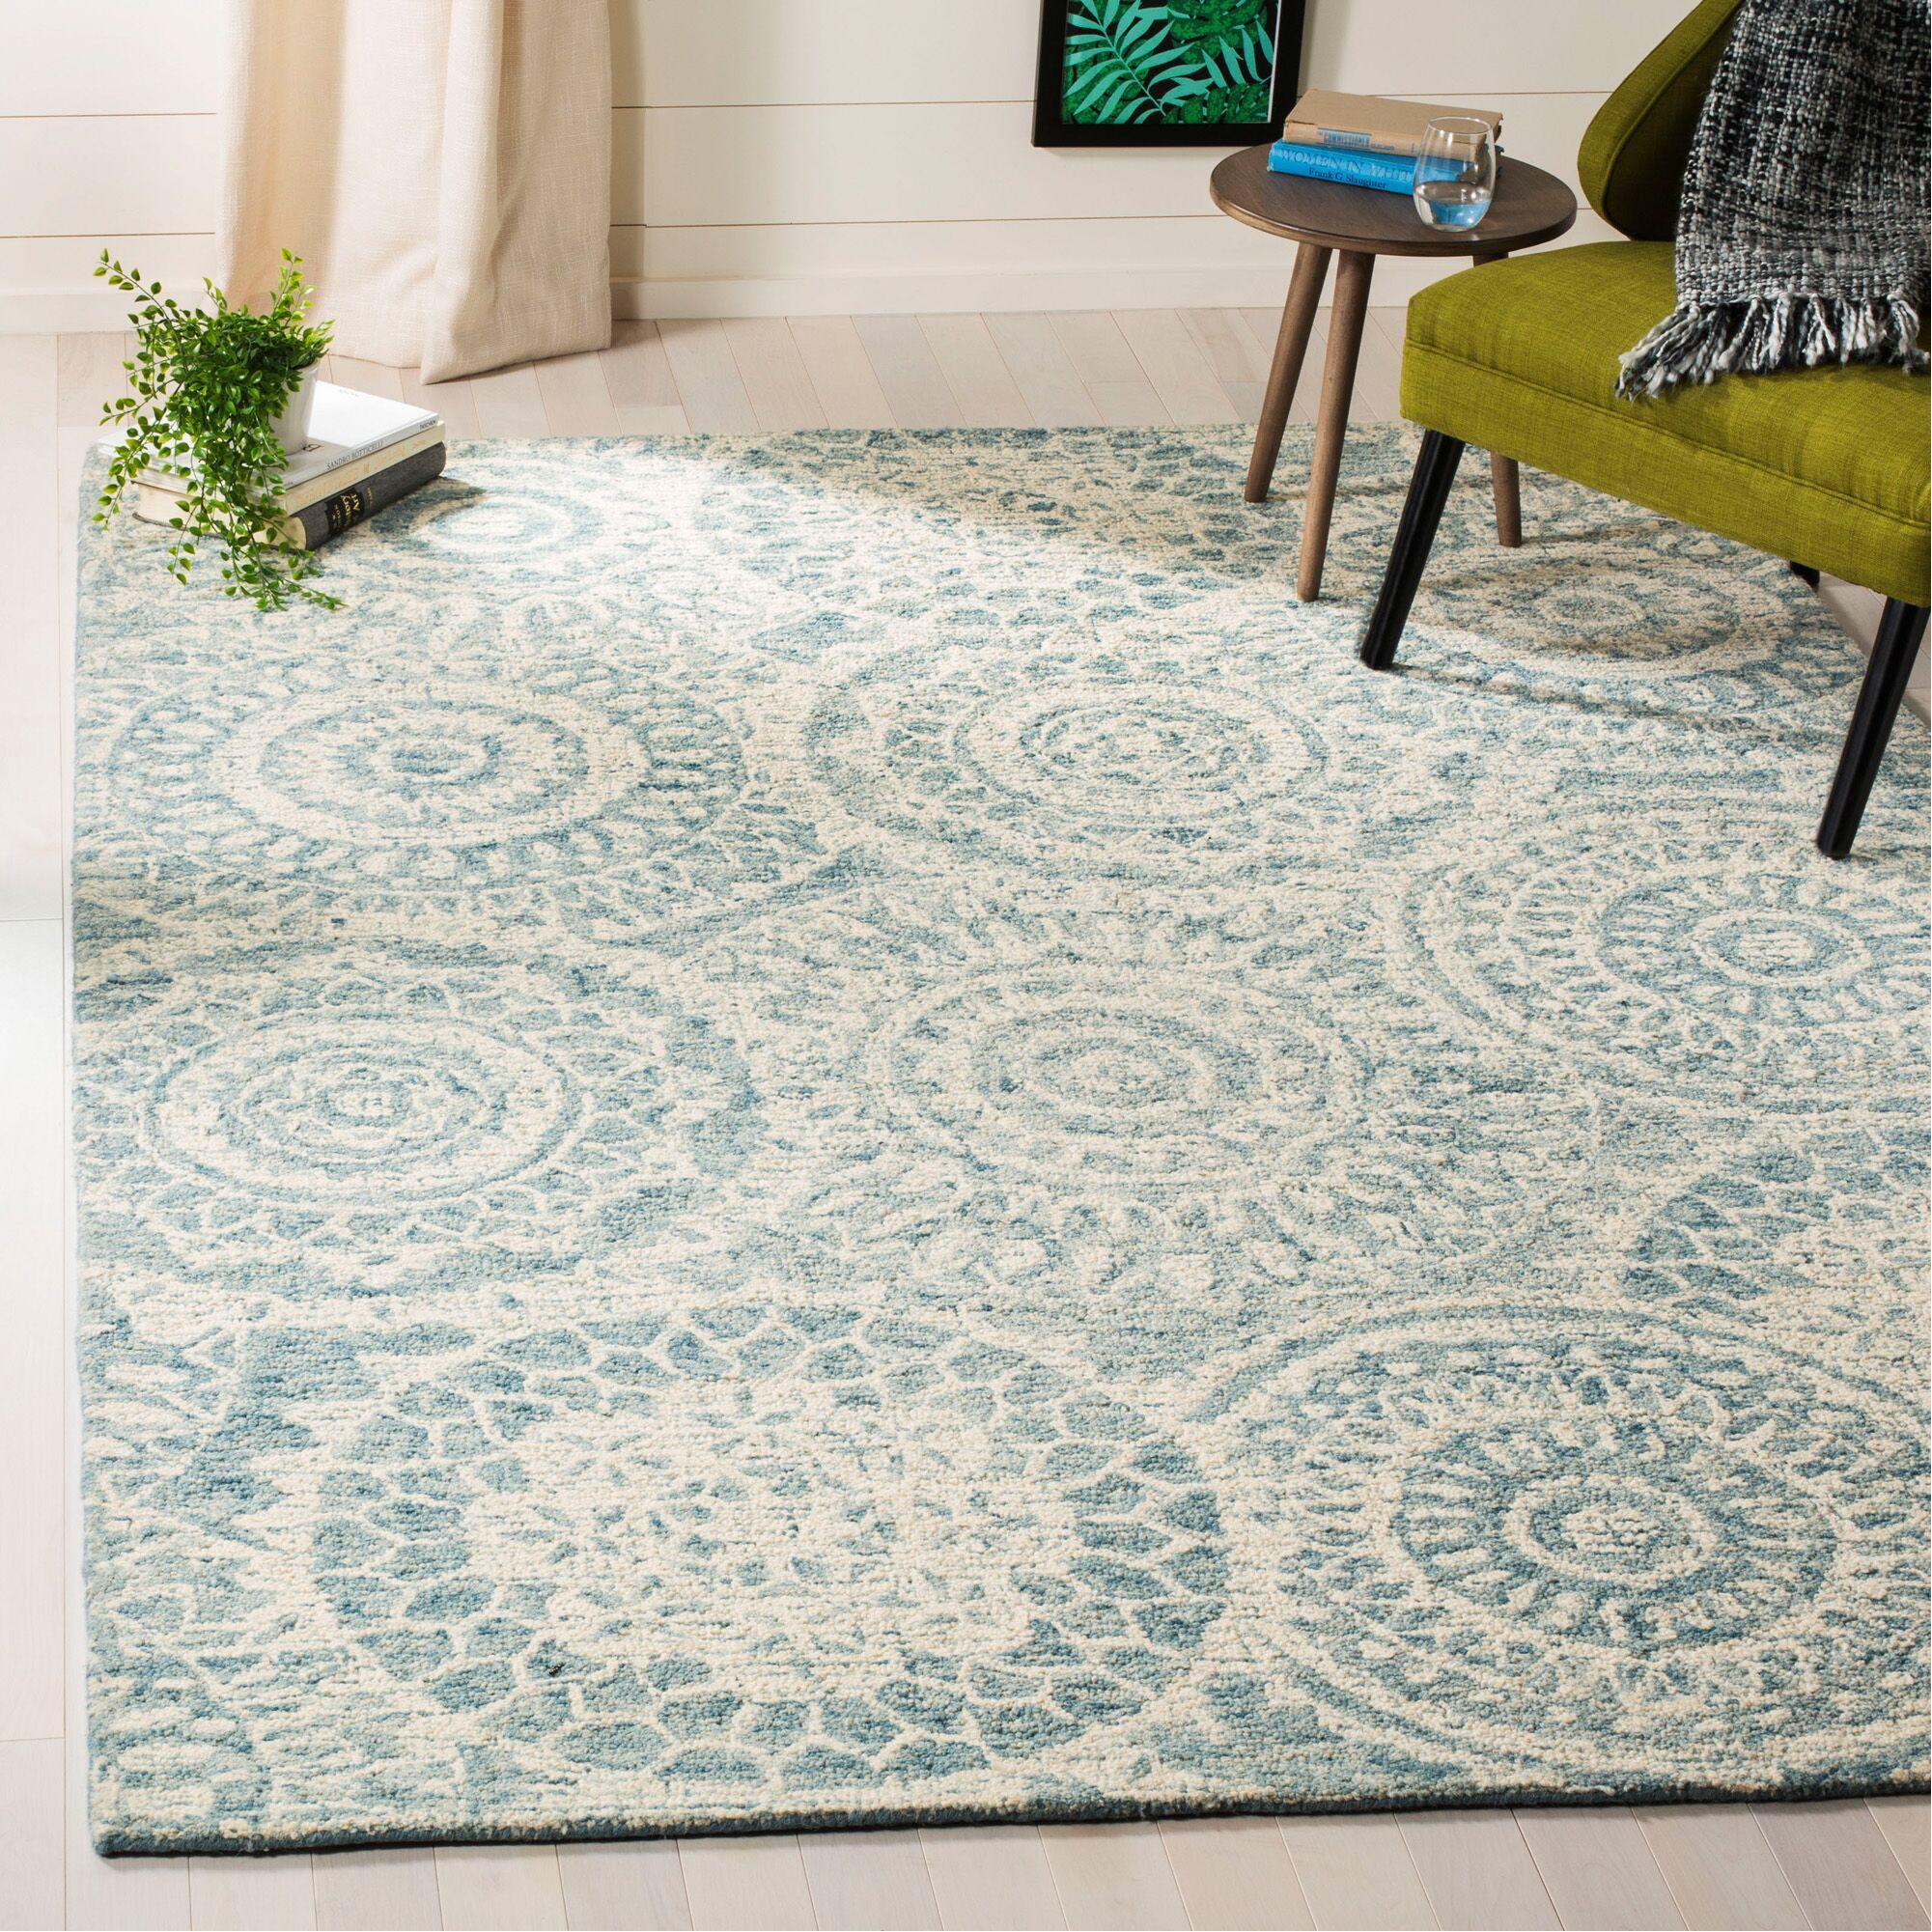 Salerna Hand-Tufted Wool Ivory/Blue Area Rug Rug Size: Rectangle 6' x 9'